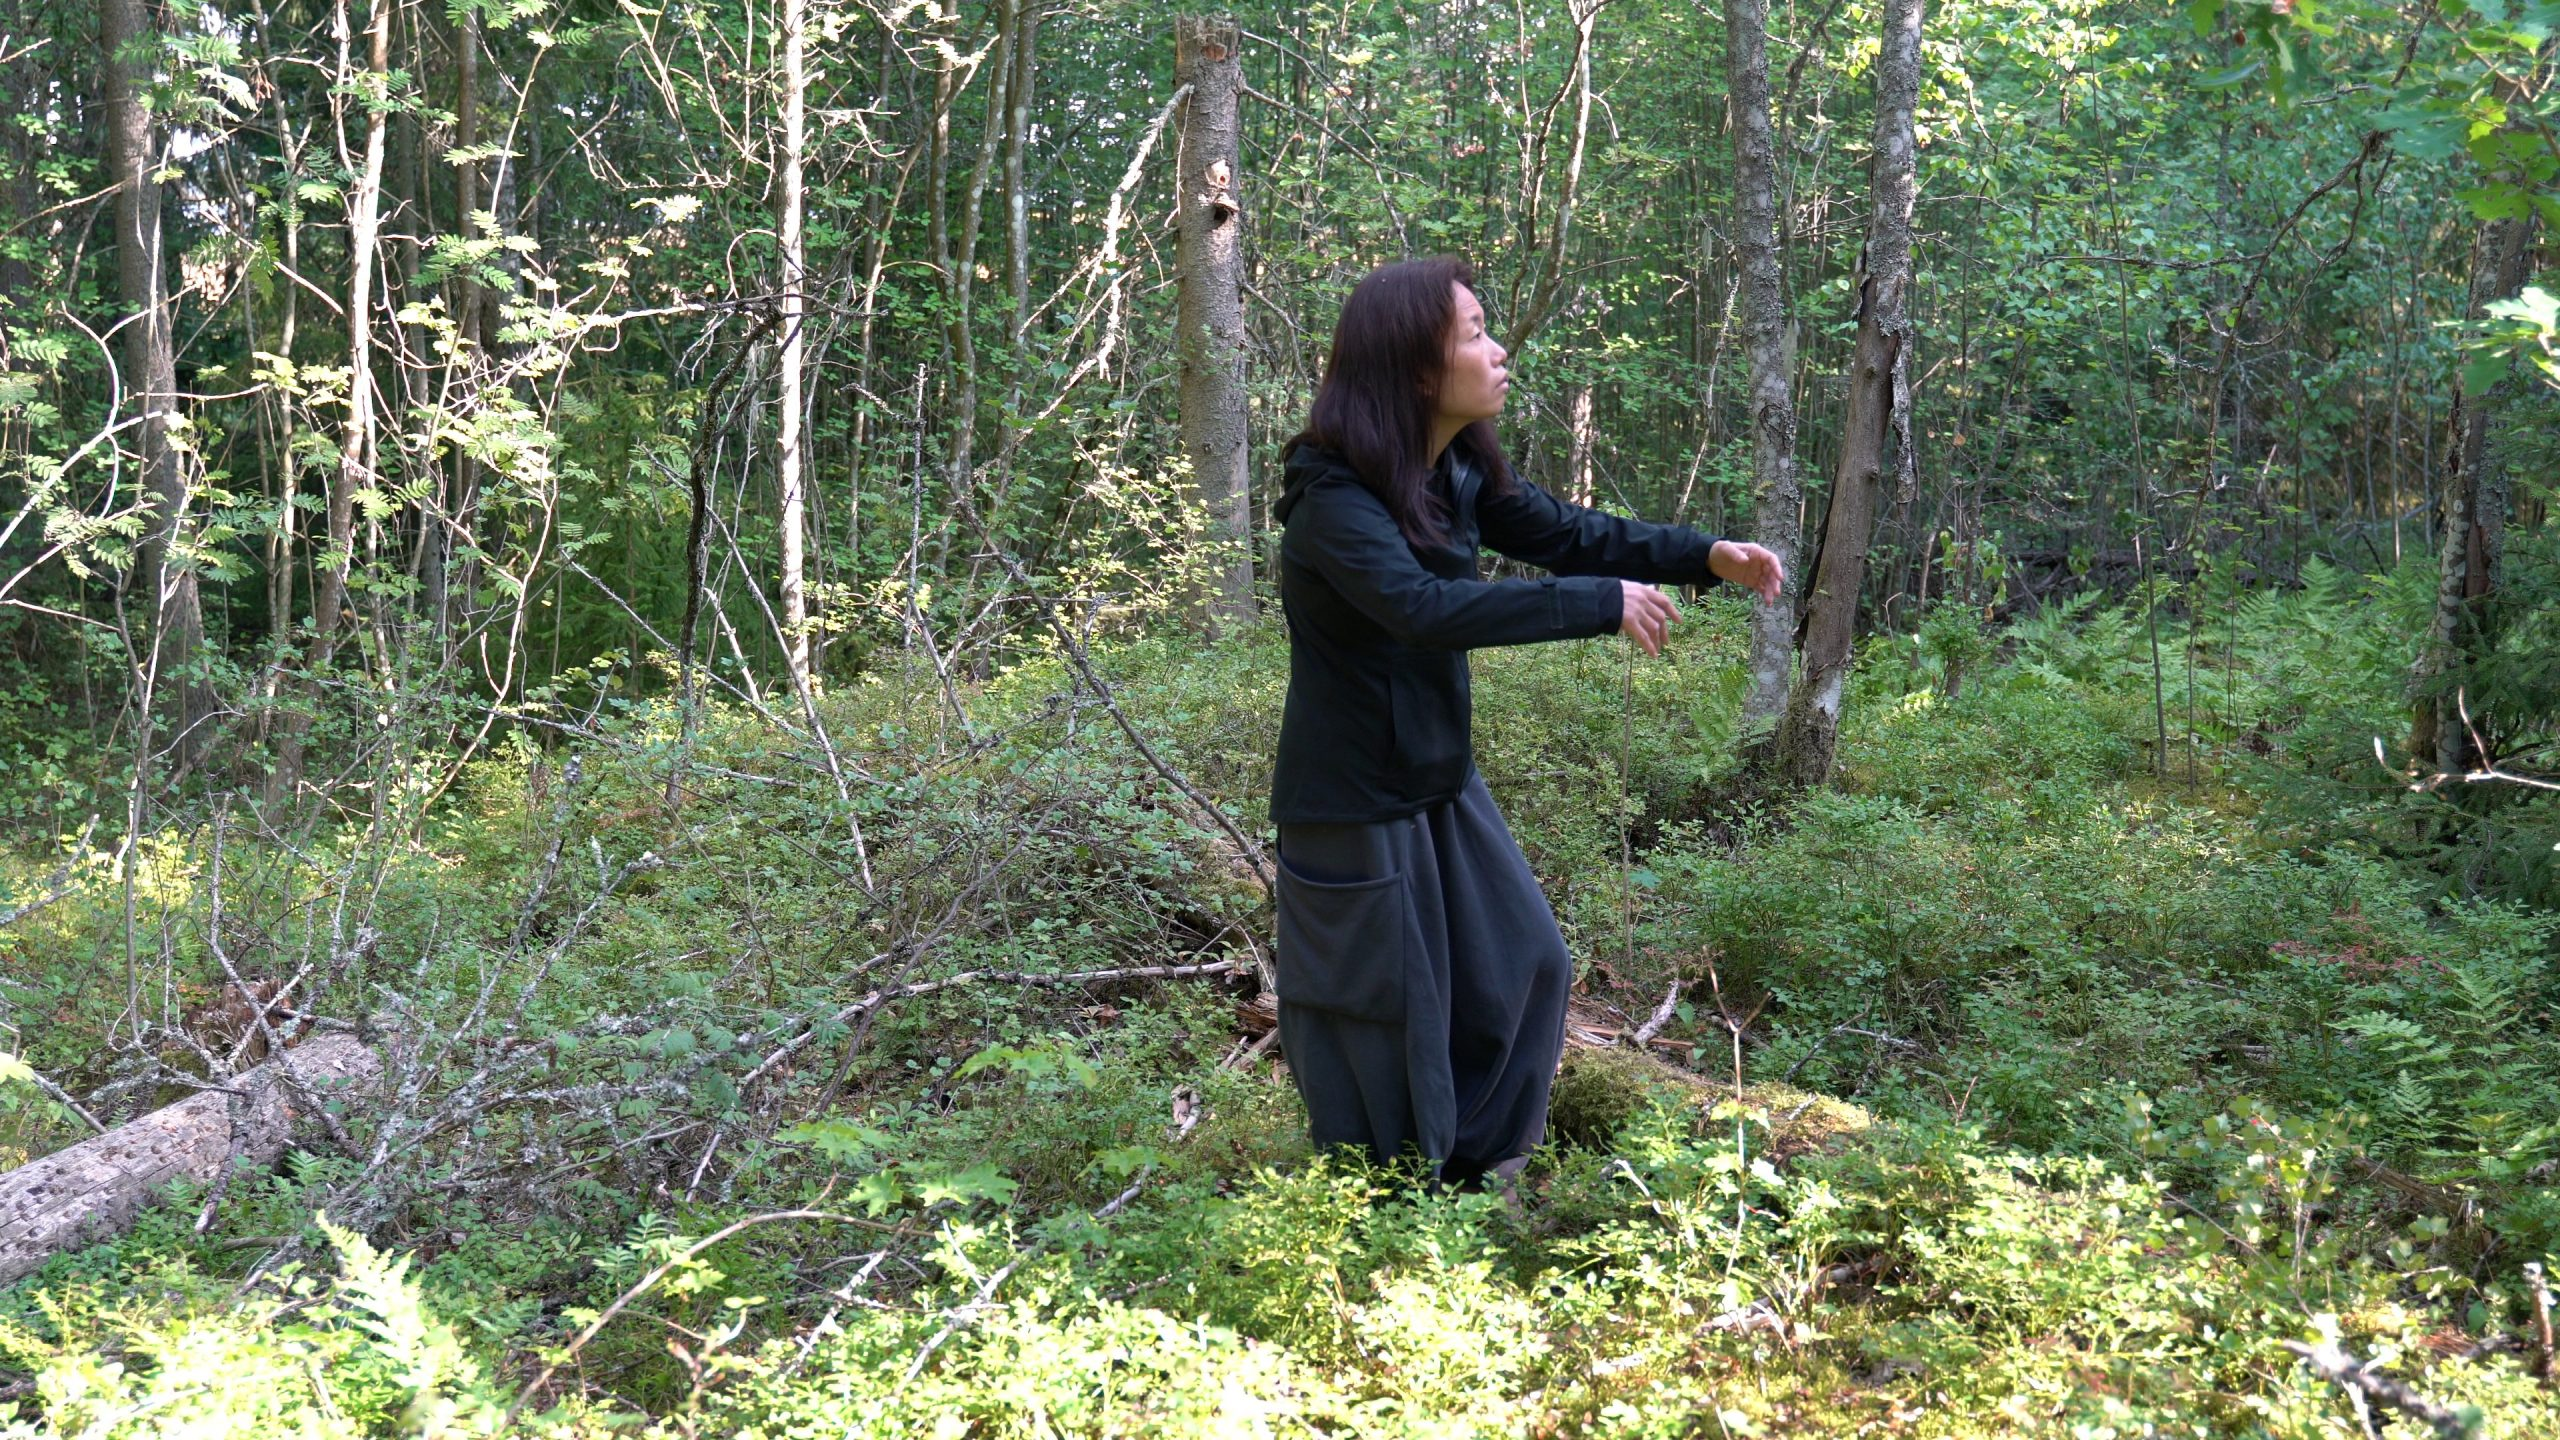 archive : 清水恵み Megumi SHIMIZU